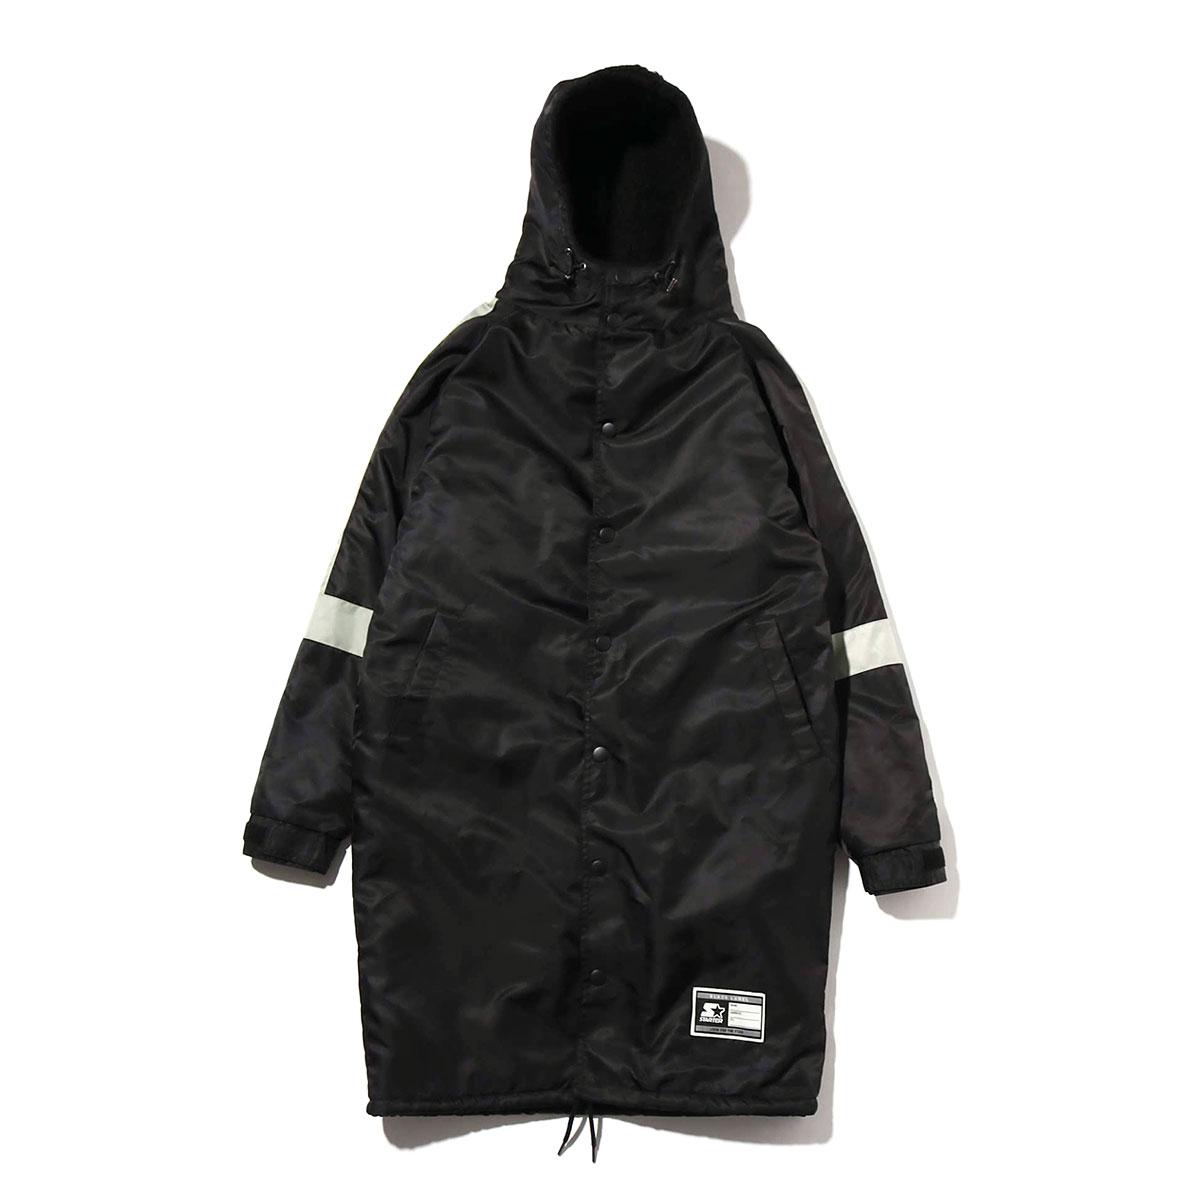 STARTER BENCH COAT(BLACK)(スターター ベンチコート)【メンズ】【コート】【18FW-I】